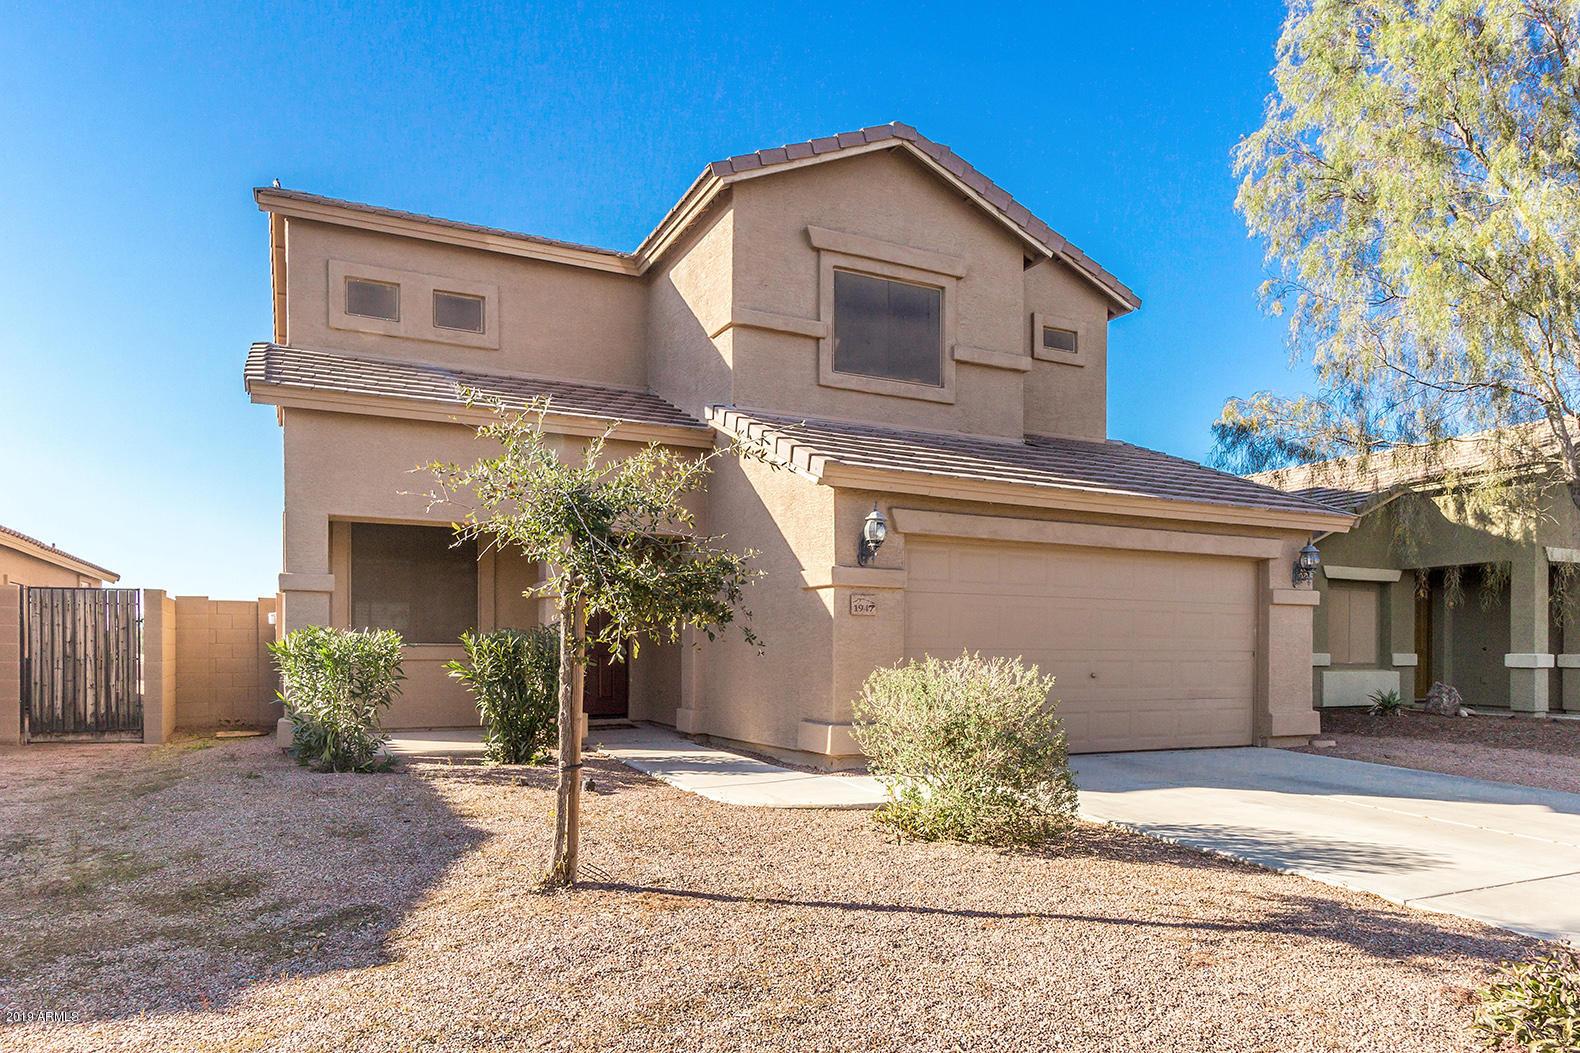 Photo for 1947 N Vista Lane, Casa Grande, AZ 85122 (MLS # 5862690)